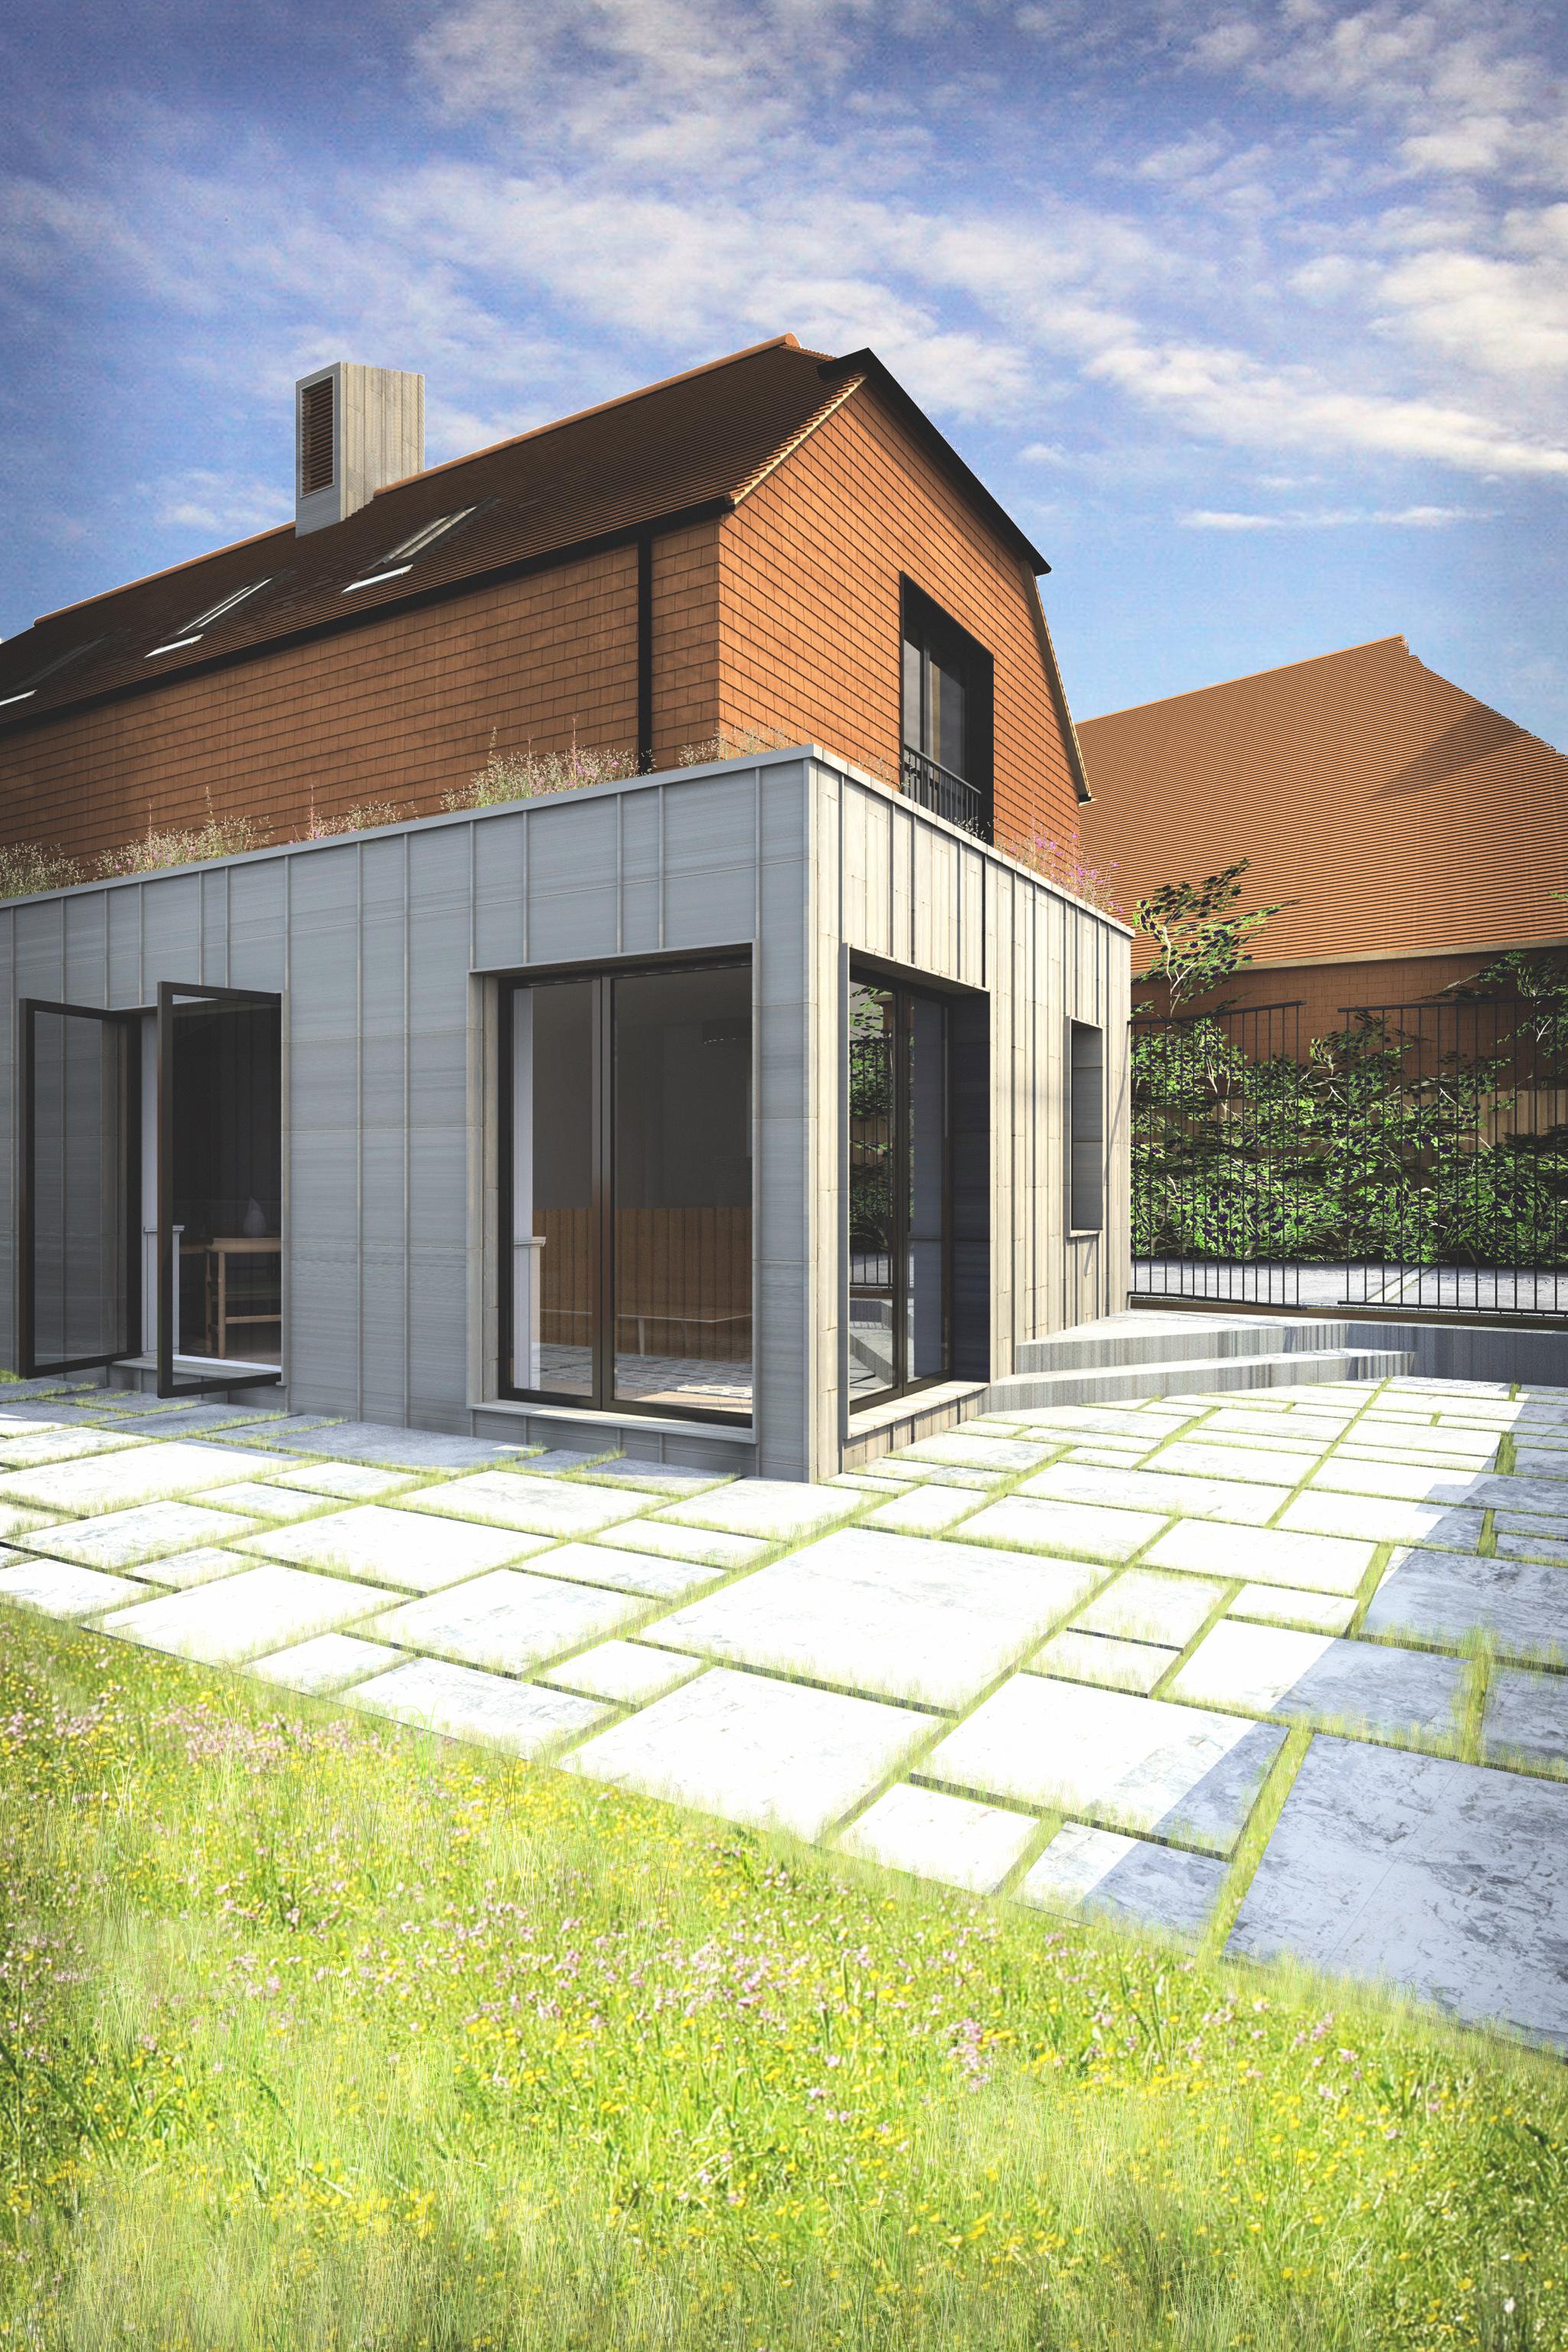 ext1small?w=980&h=980&crop=1 planning permission jmarchitectblog,Planning Permission For New House